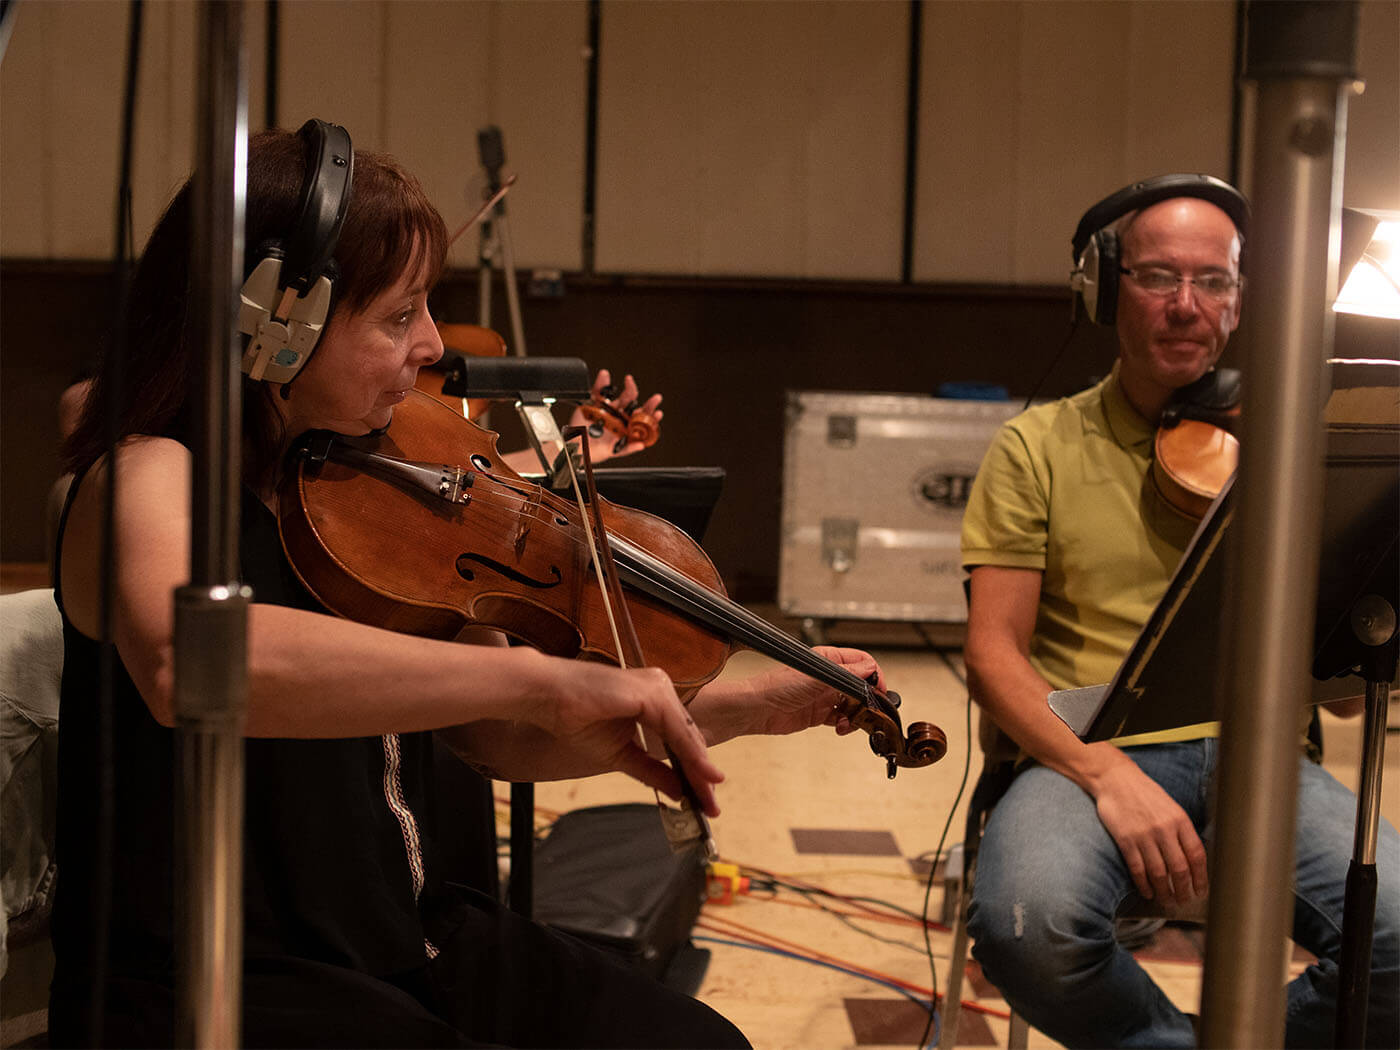 Violinist recording in orchestra